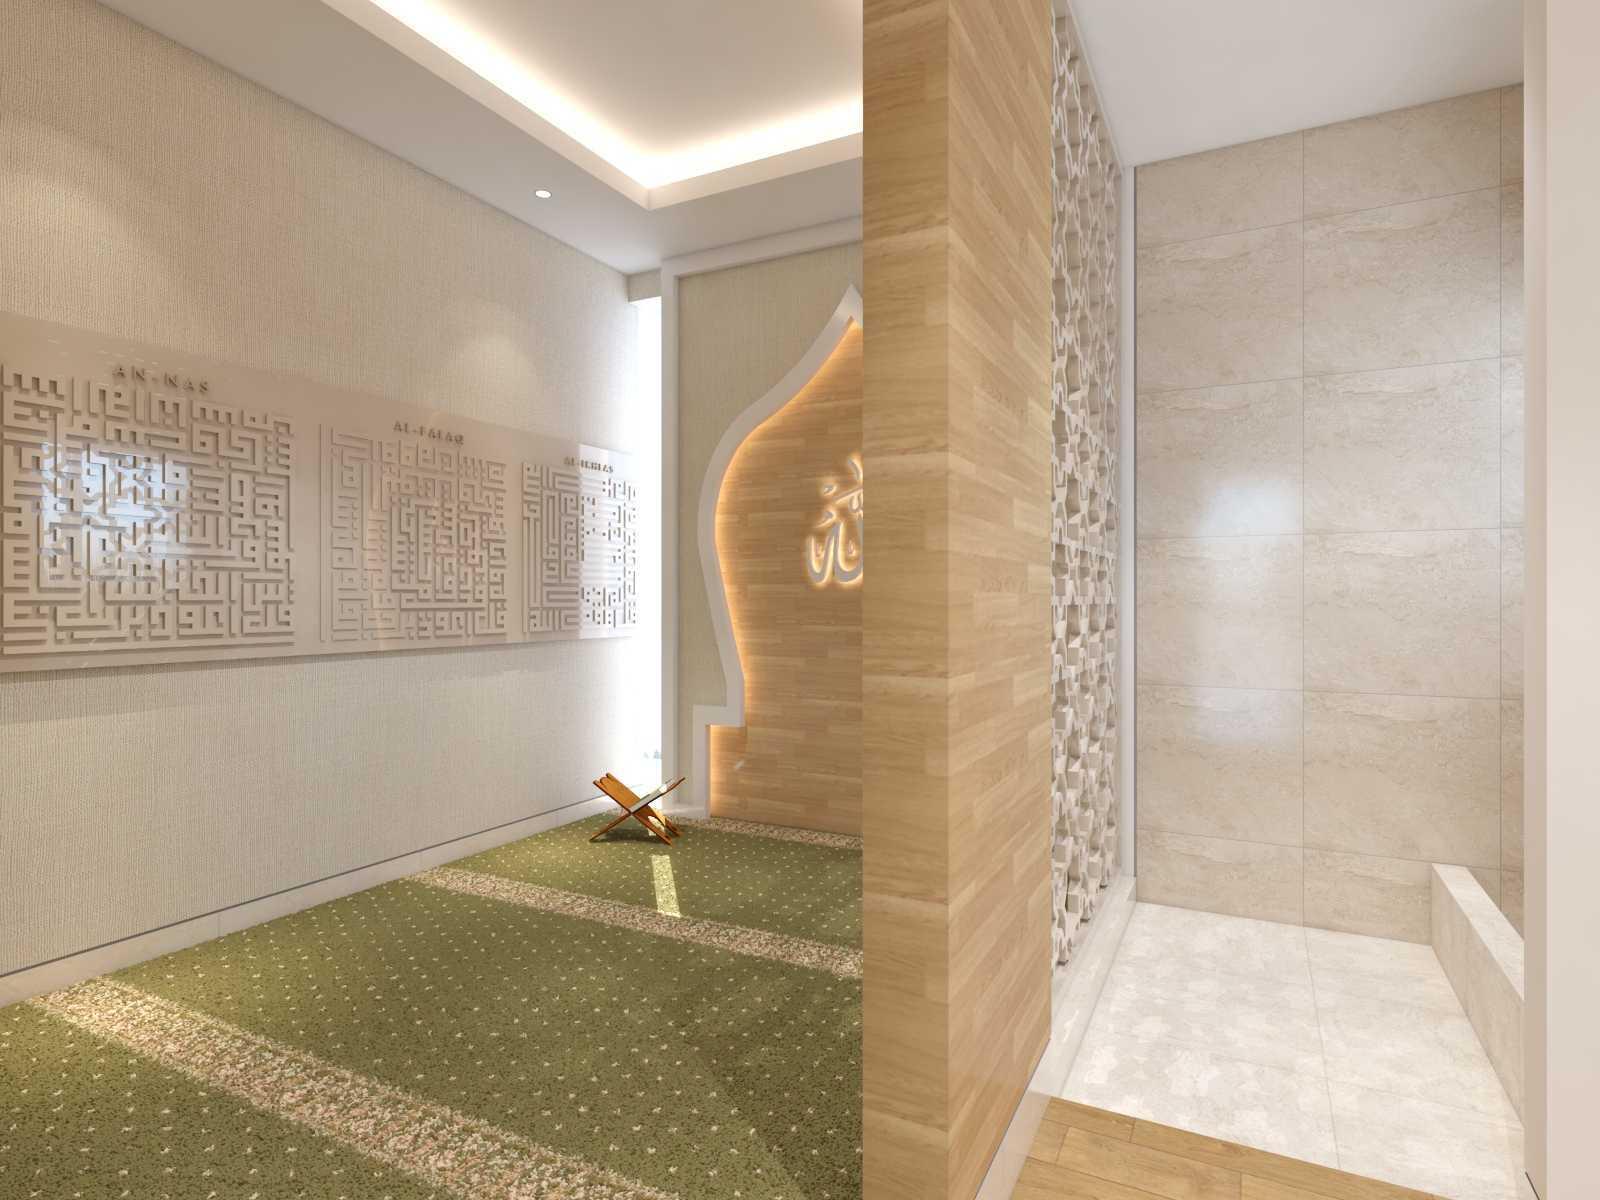 Conarch Studio Fr  House Surakarta, Kota Surakarta, Jawa Tengah, Indonesia Surakarta, Kota Surakarta, Jawa Tengah, Indonesia Conarch-Bangun-Sejahtera-Fr-House  78918